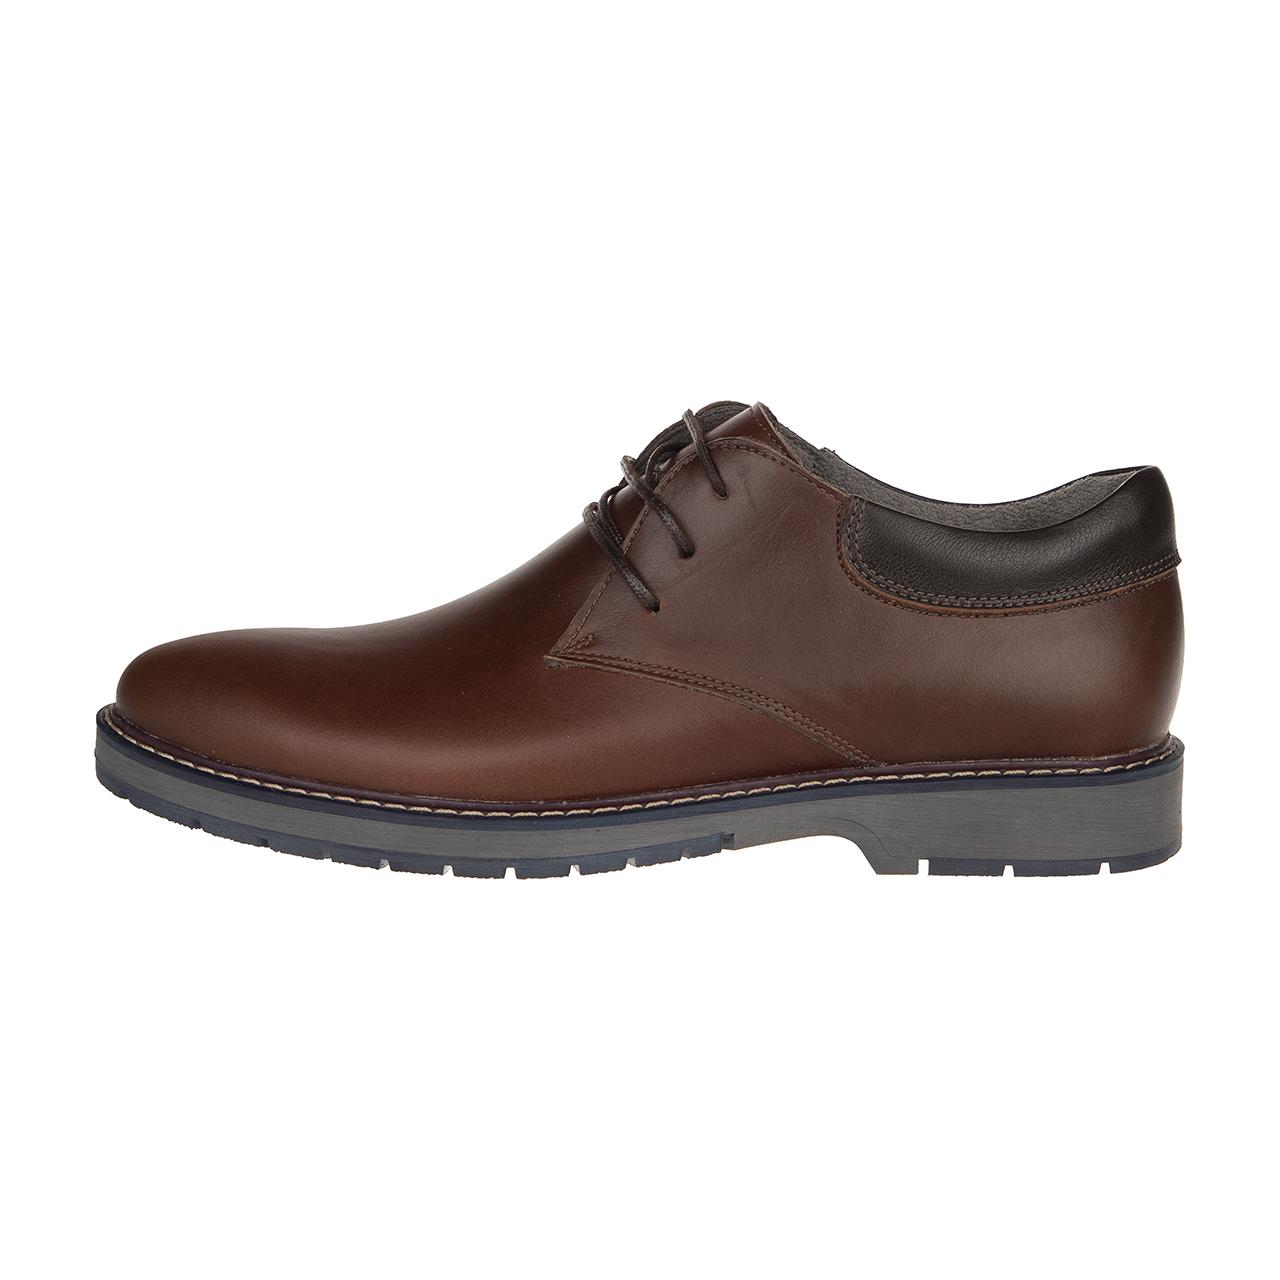 کفش مردانه چرم طبیعی مدل بندی قهوه ای کد39